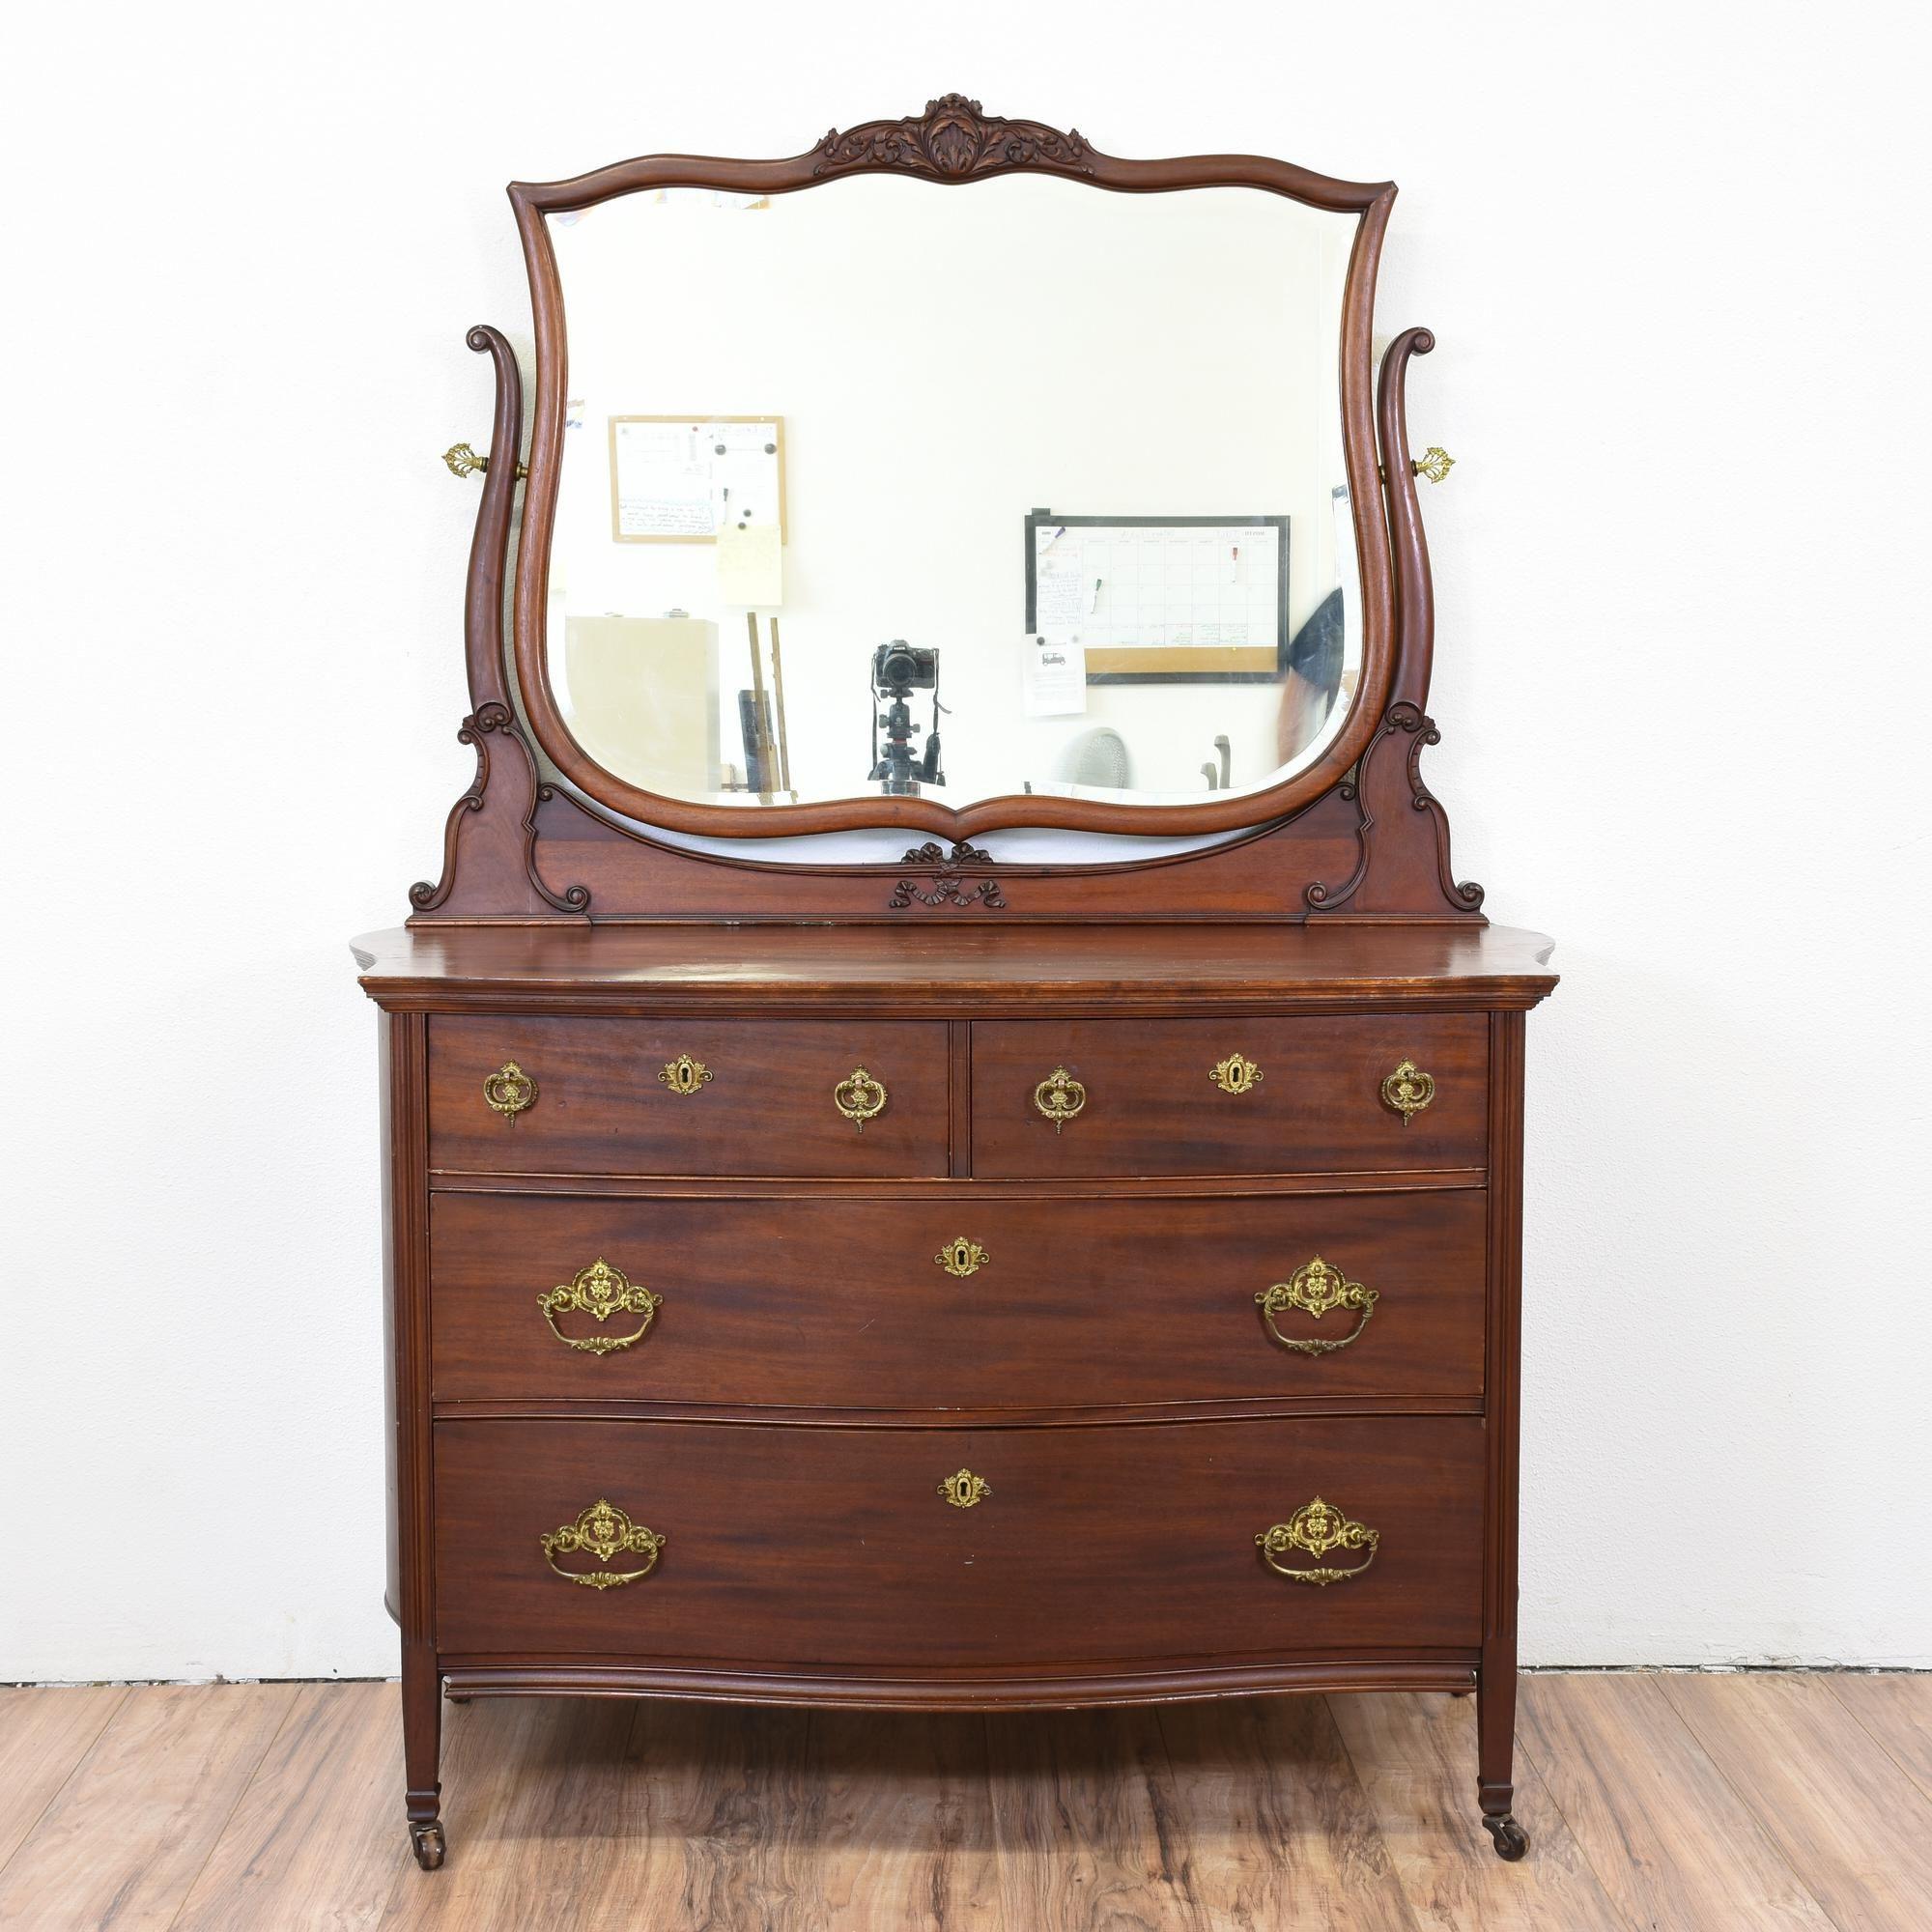 antique mahogany dresser with mirror bestdressers 2017. Black Bedroom Furniture Sets. Home Design Ideas